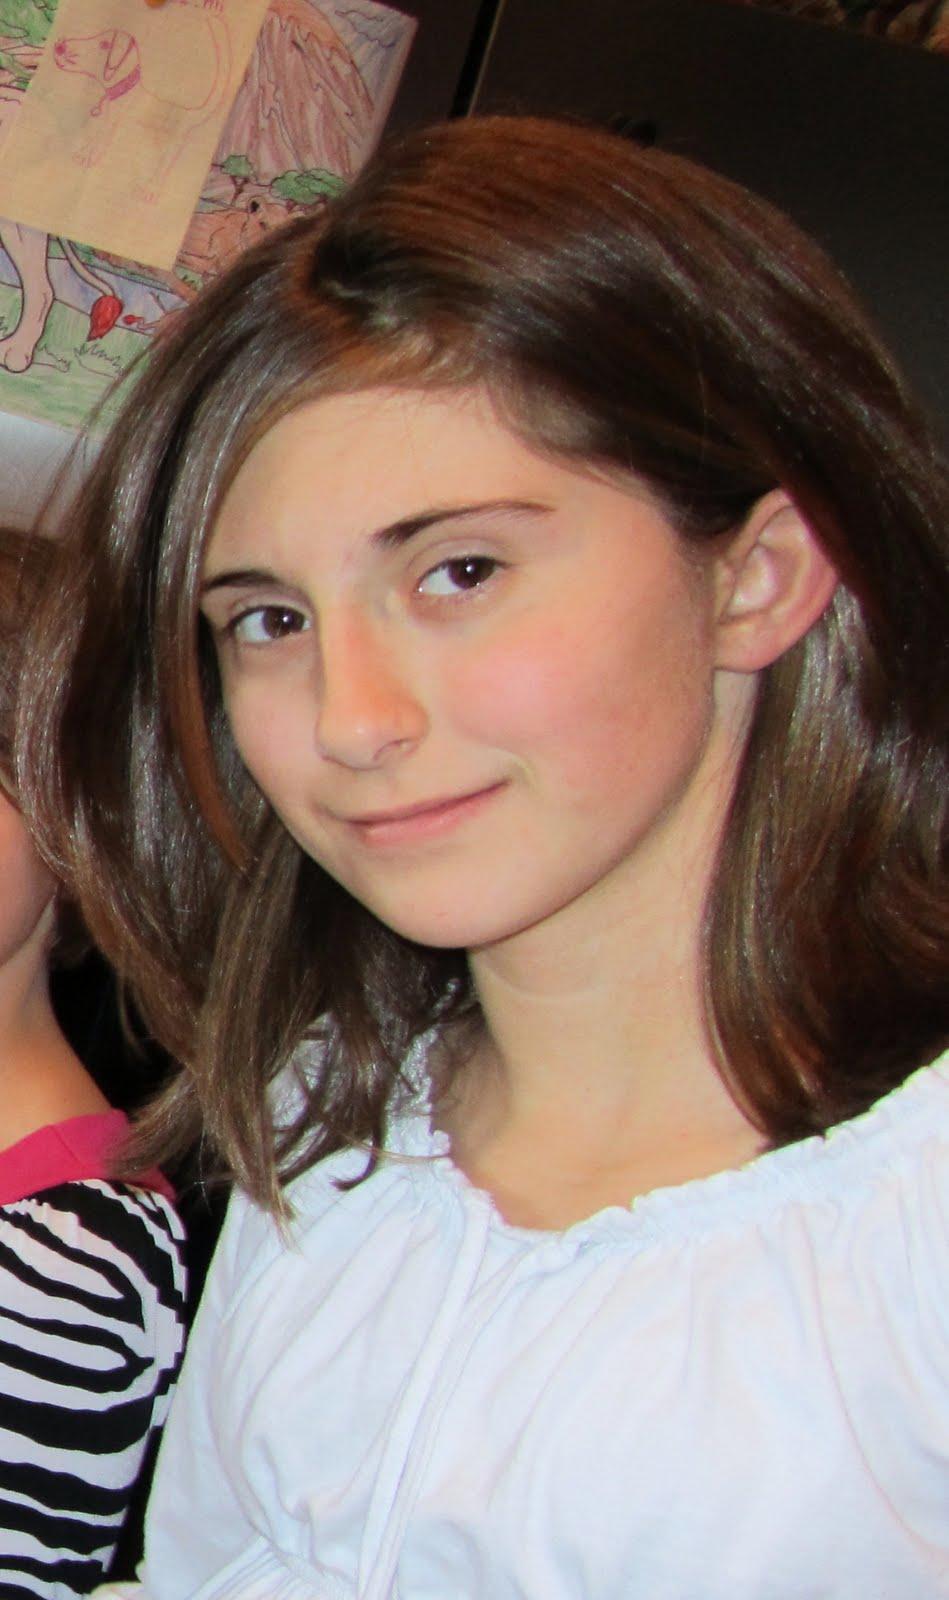 Meet Maranda, age 12, my sister's oldest daughter, my first niece